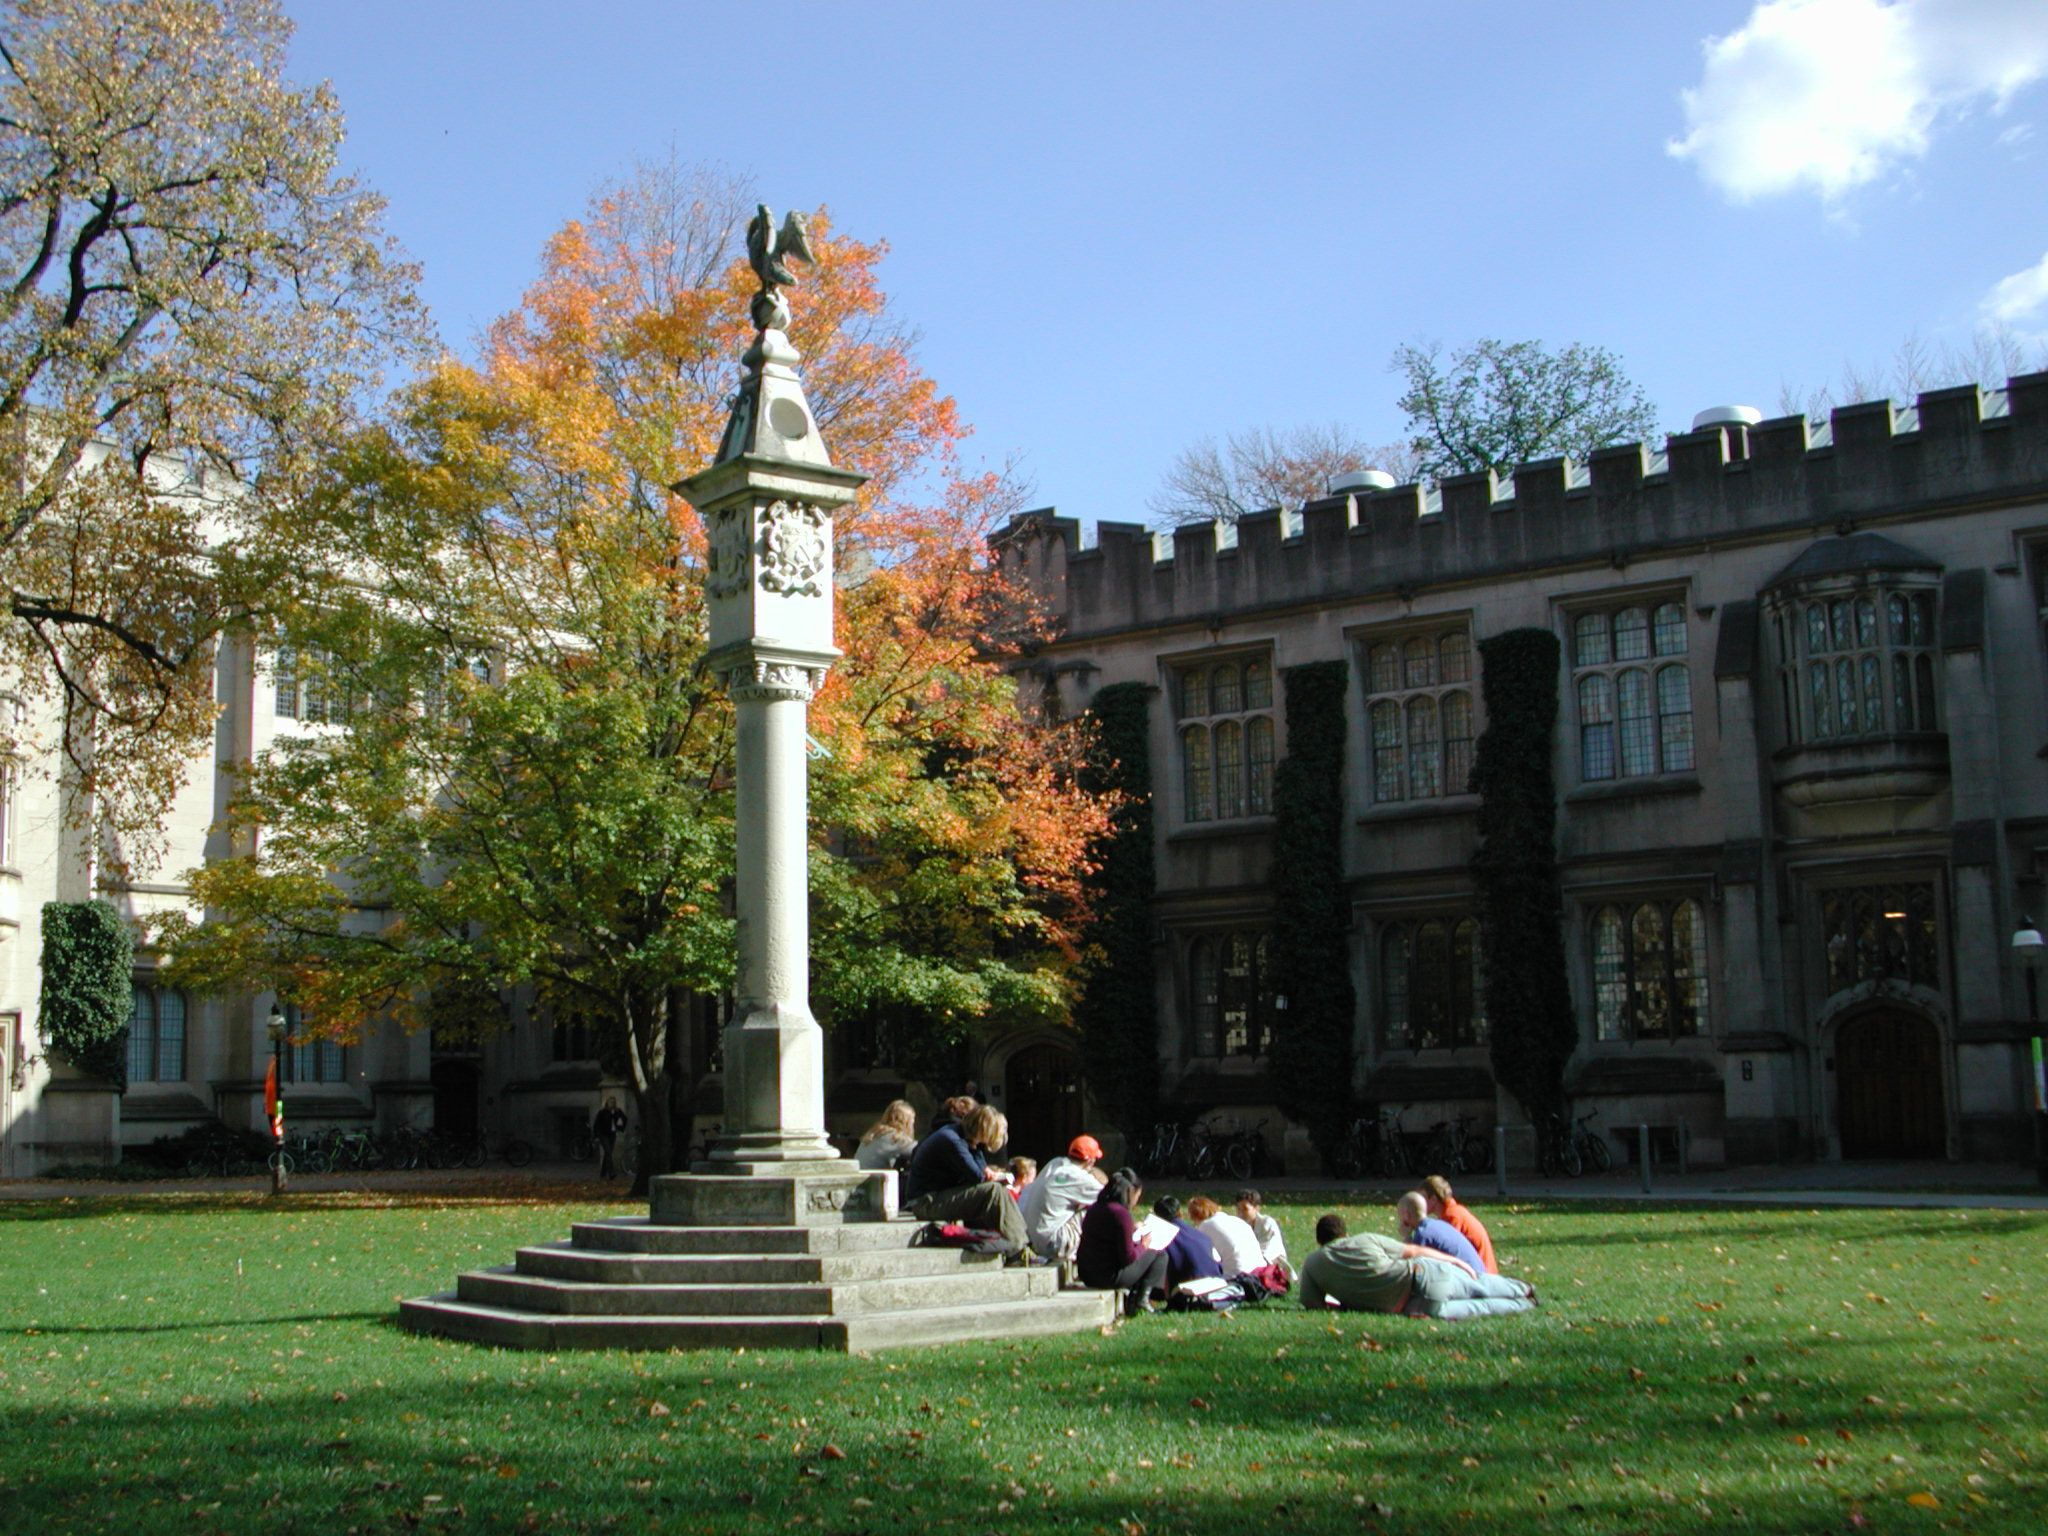 Fashion style Campus: on Looks Amber Princeton University for girls